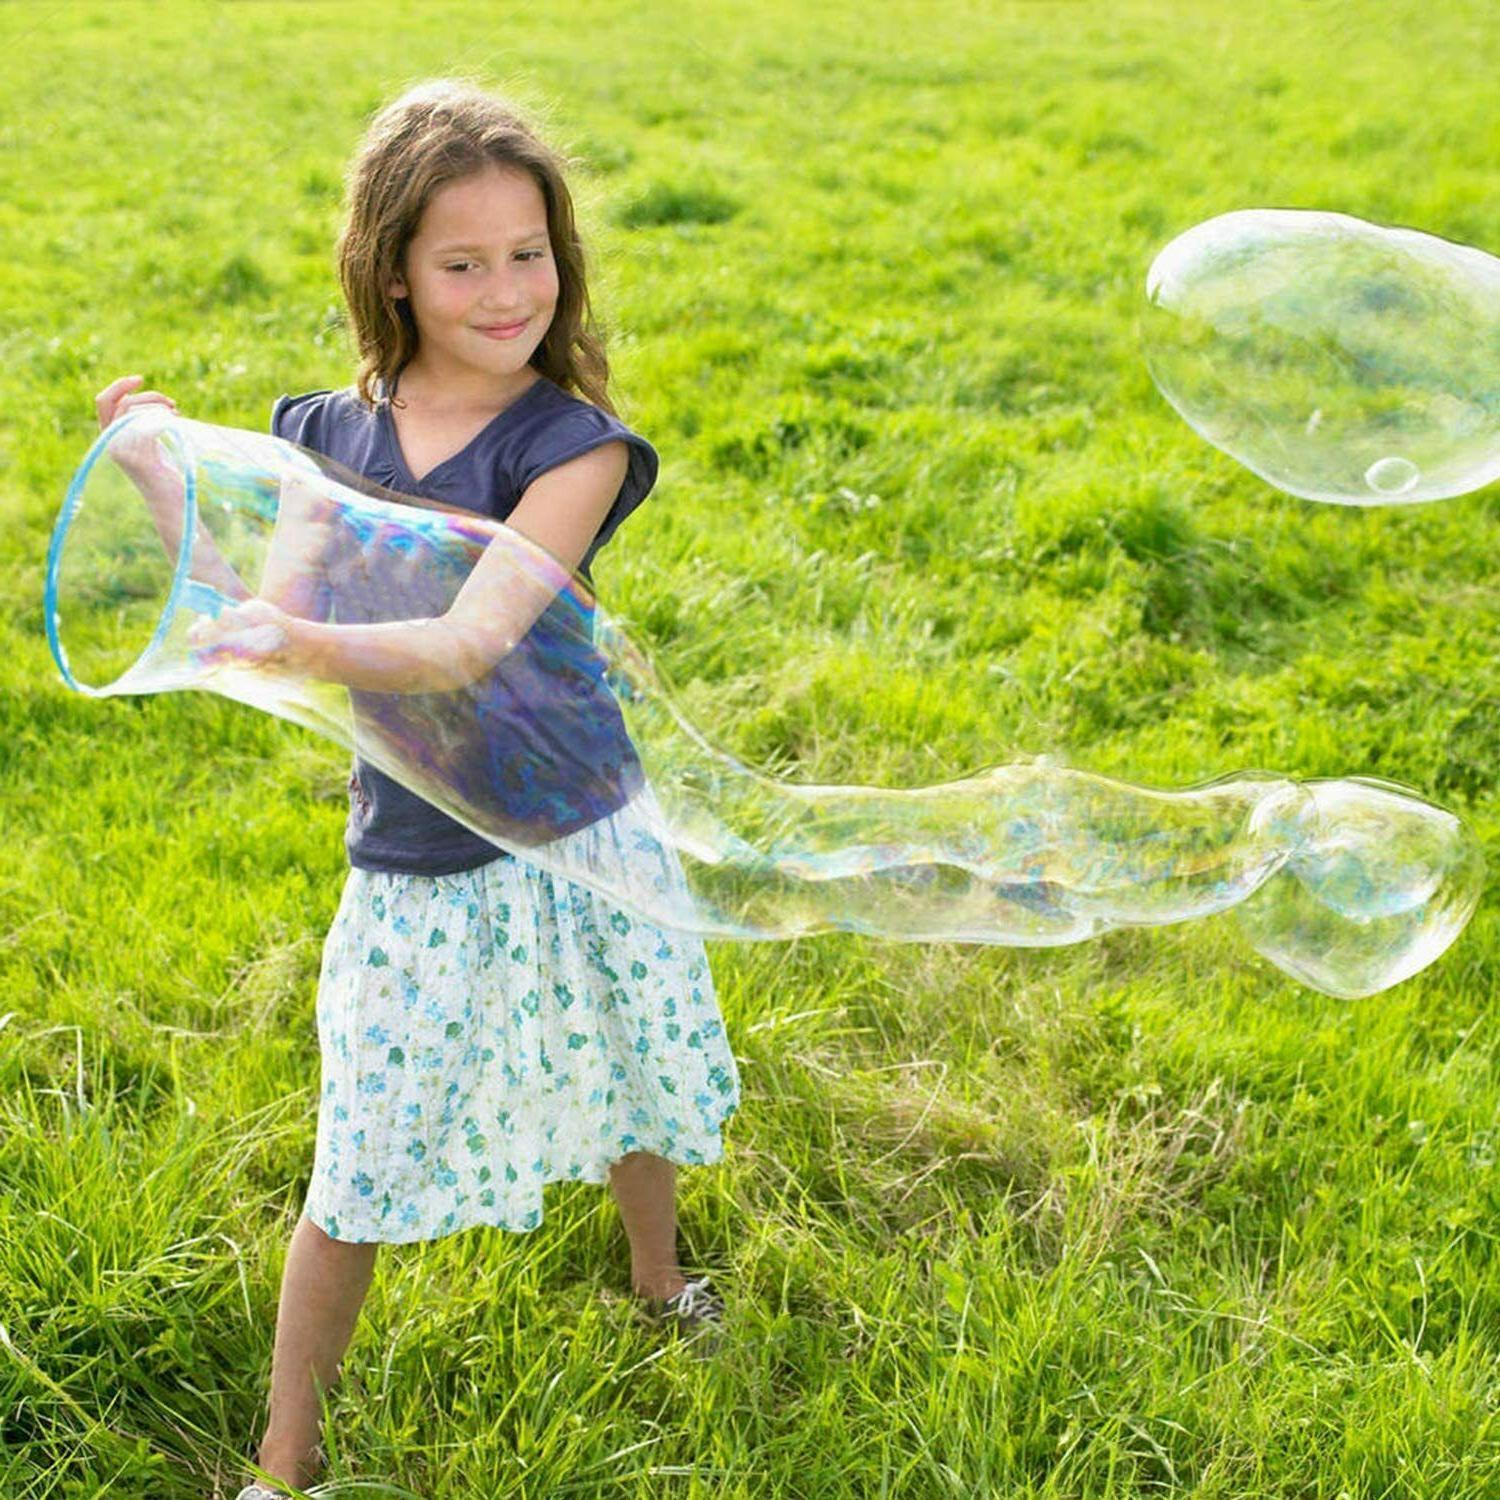 Wand Giant Wand Huge Bubbles